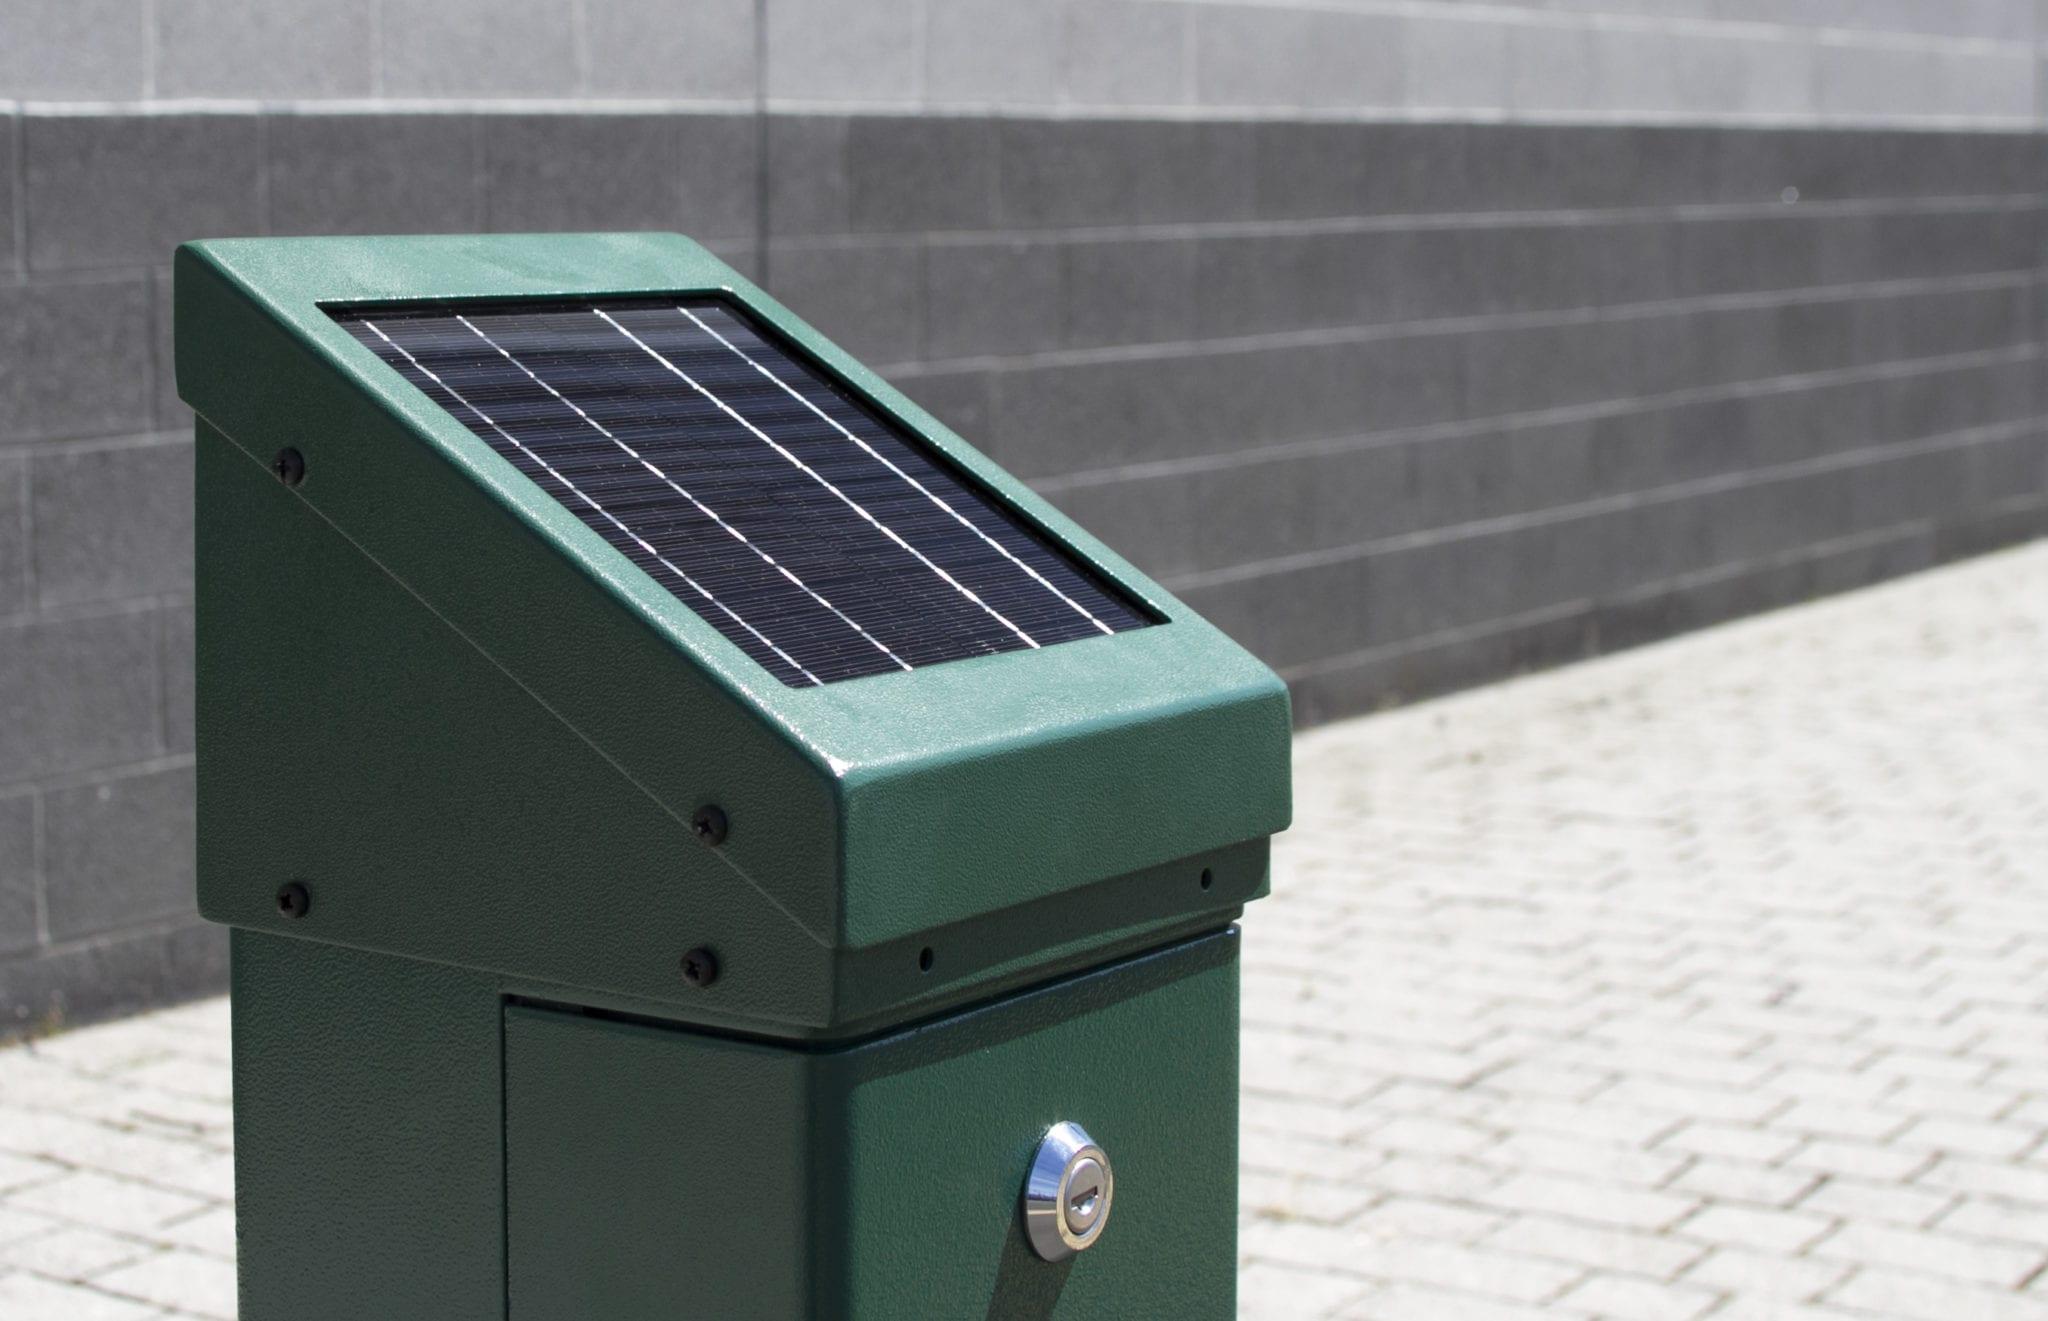 SolarCapture_SolarSolutions_CaseStudies_005